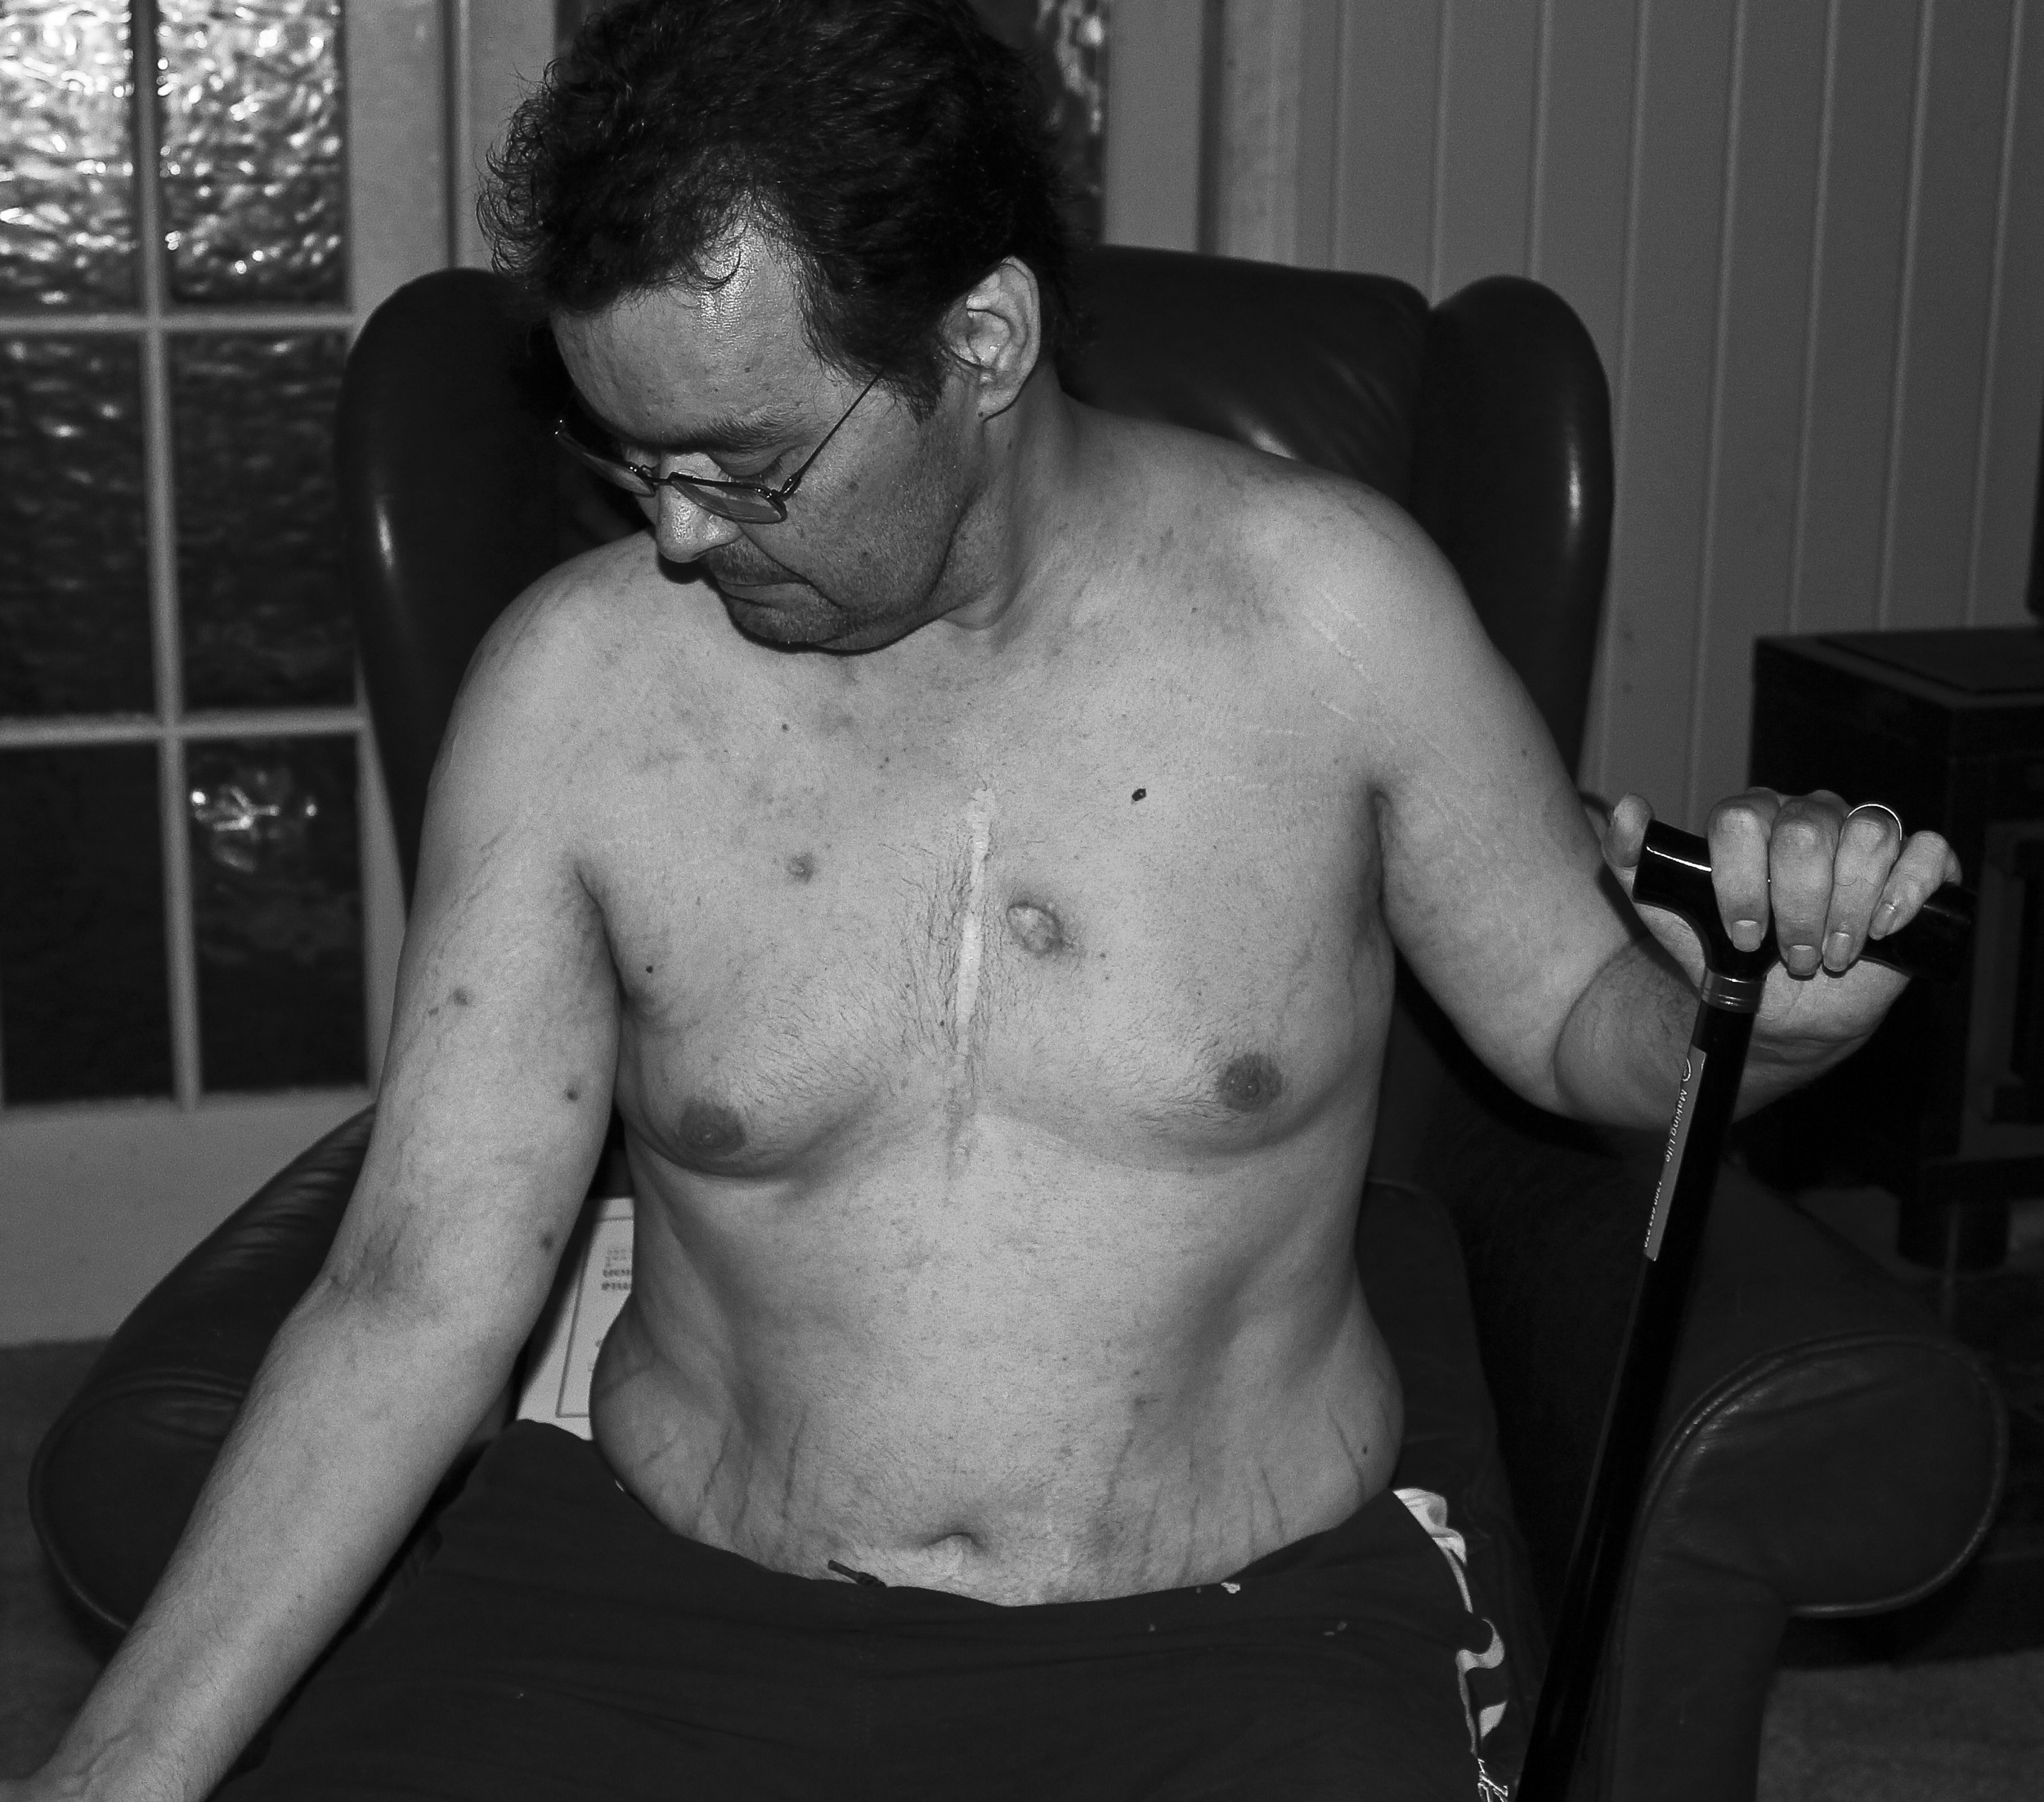 John, Non-Hodgkin's Lymphoma Survivor by Michelle Watters